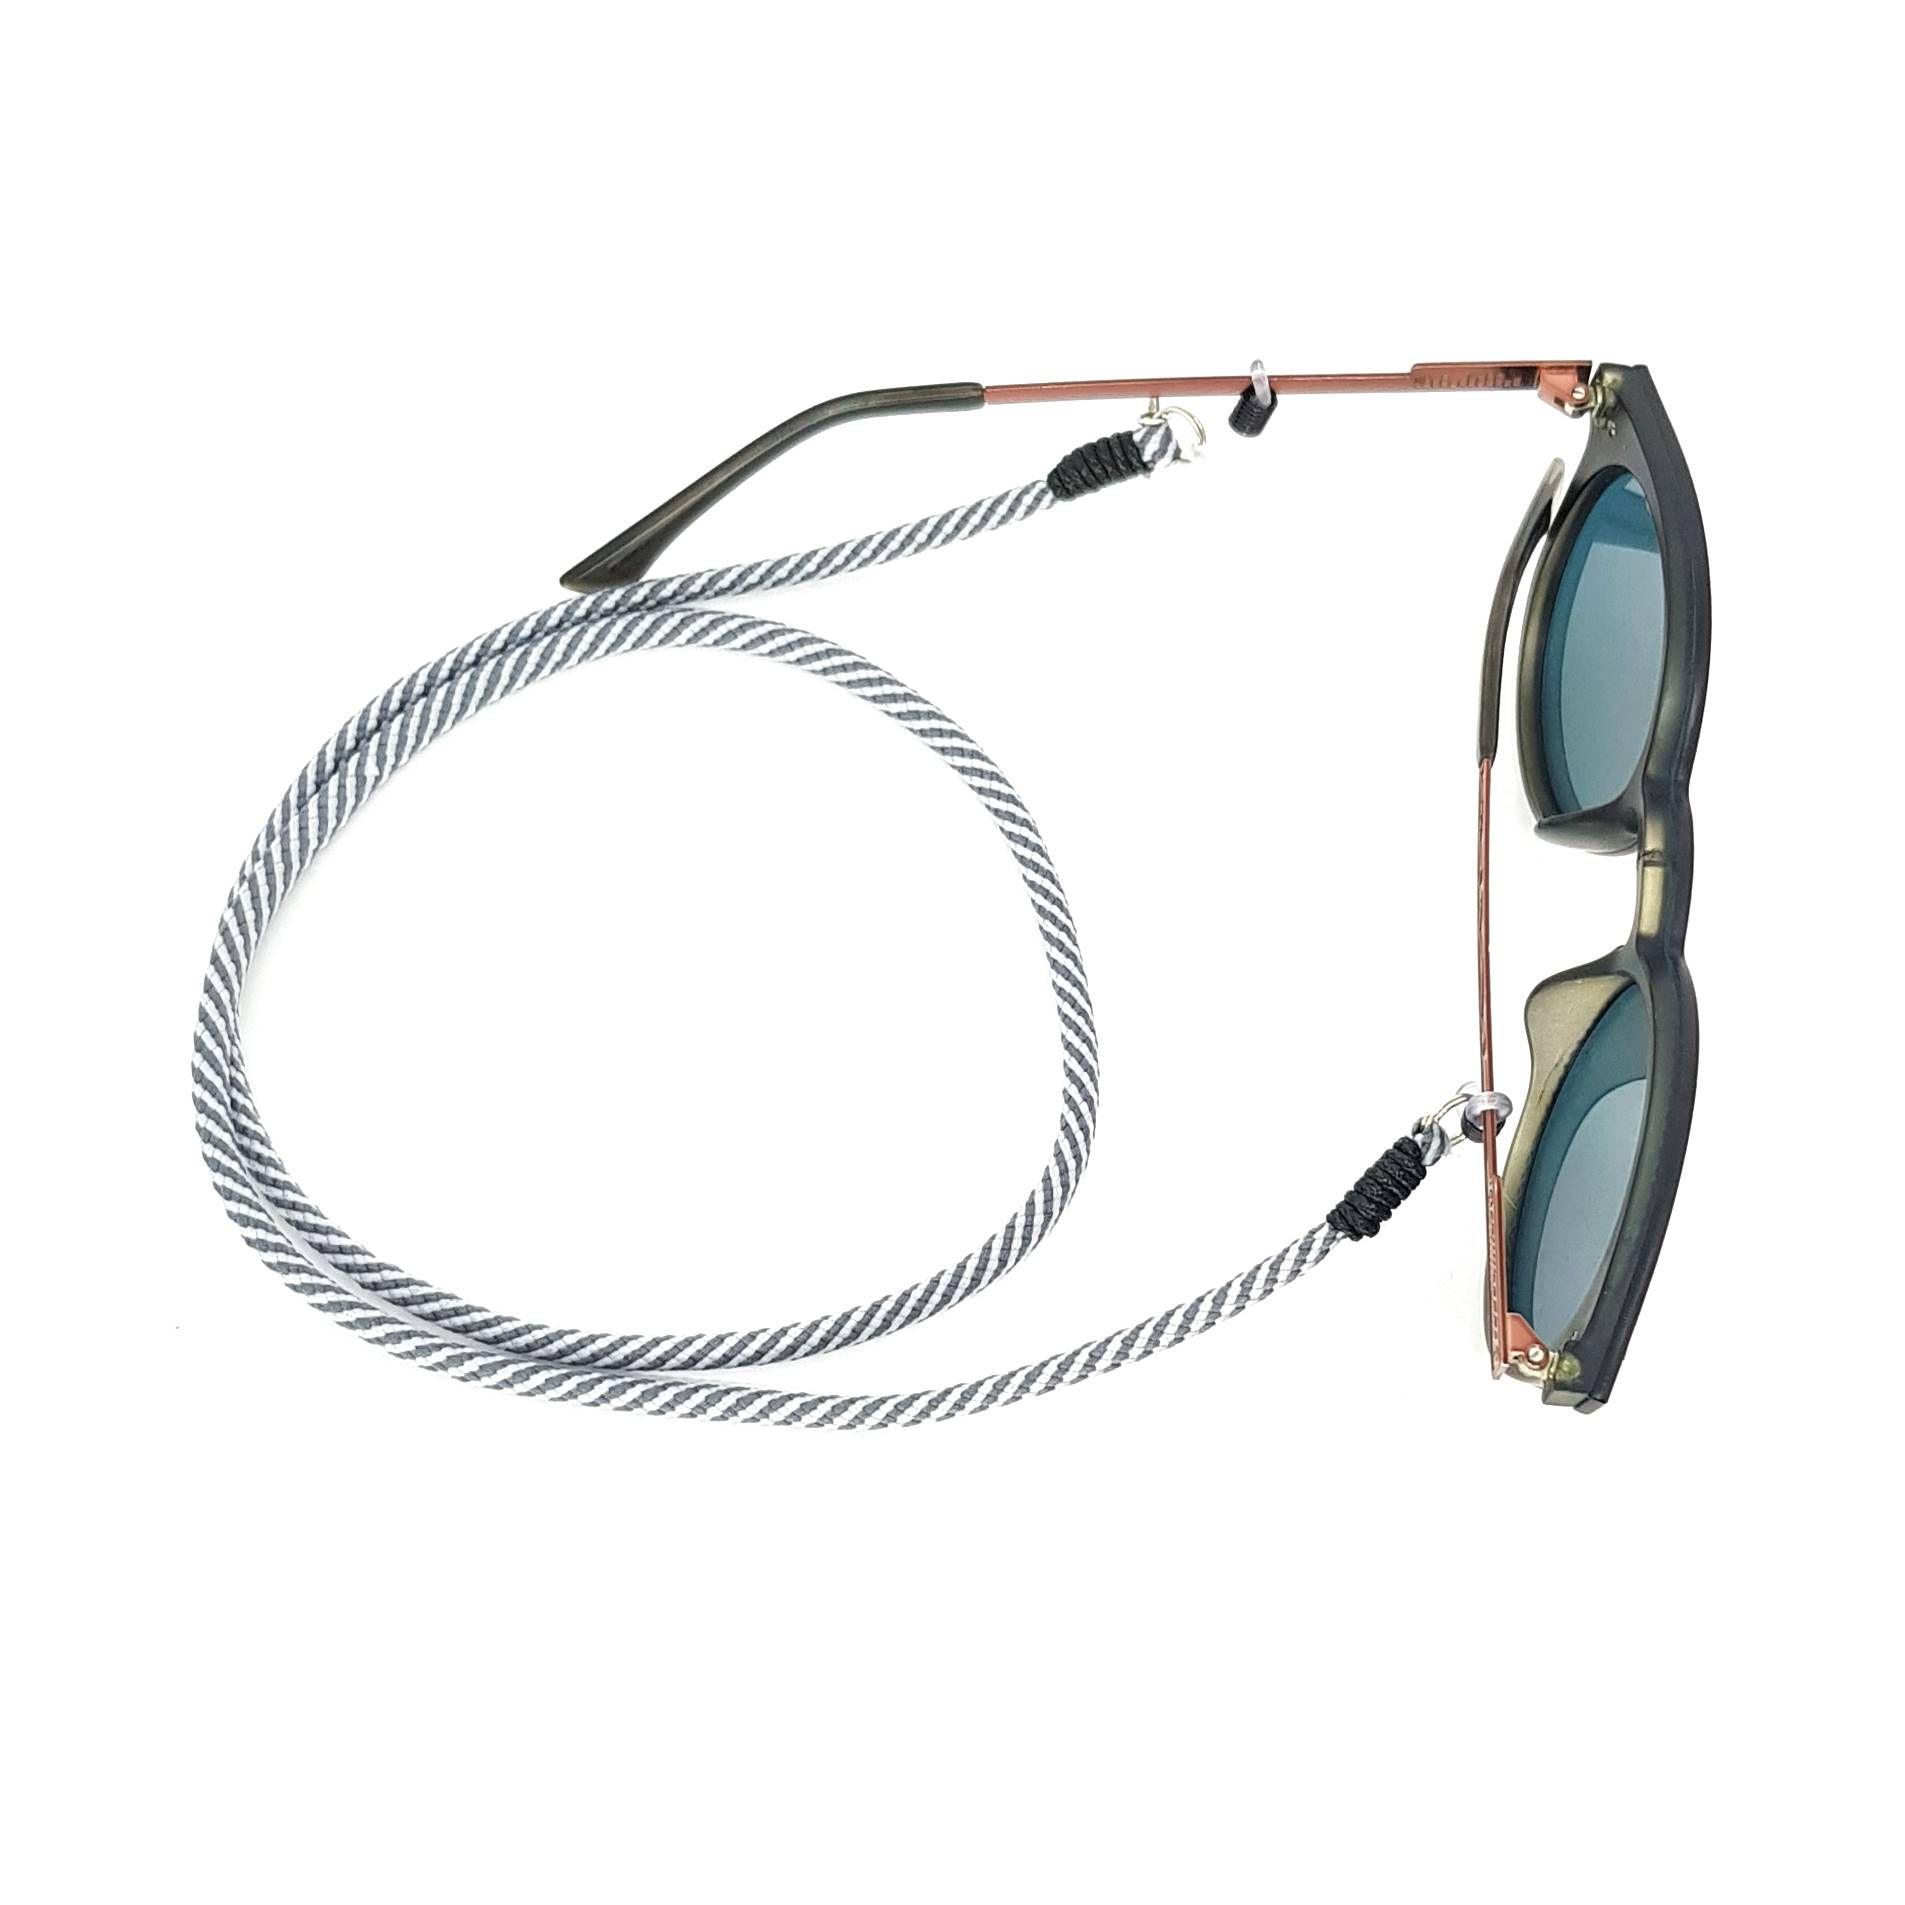 Cordão para Óculos Cinza Listrado